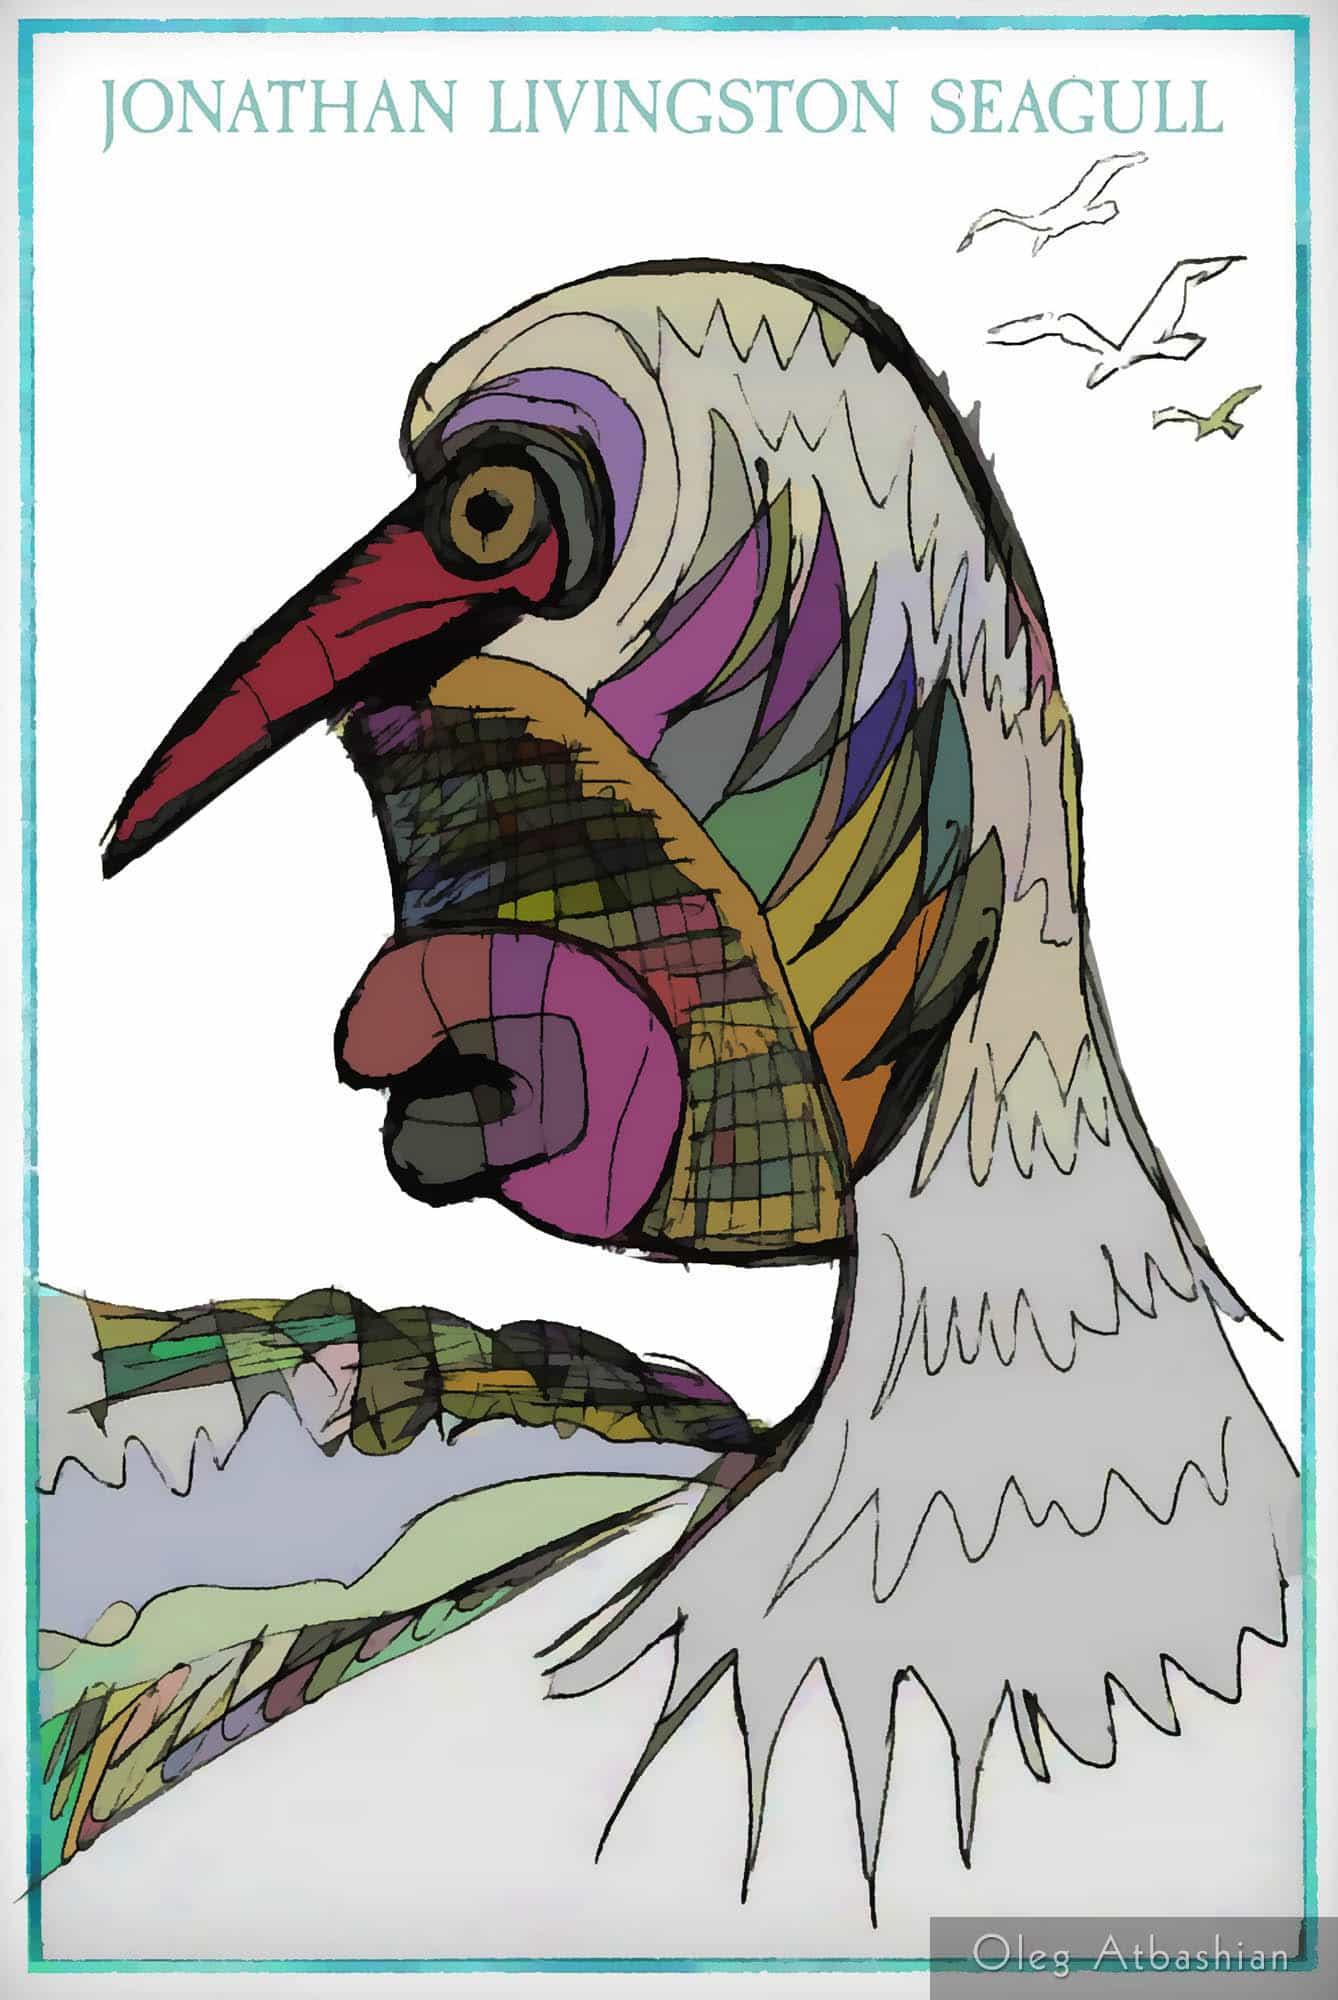 Cartoon: Jonathan Livingston Seagull